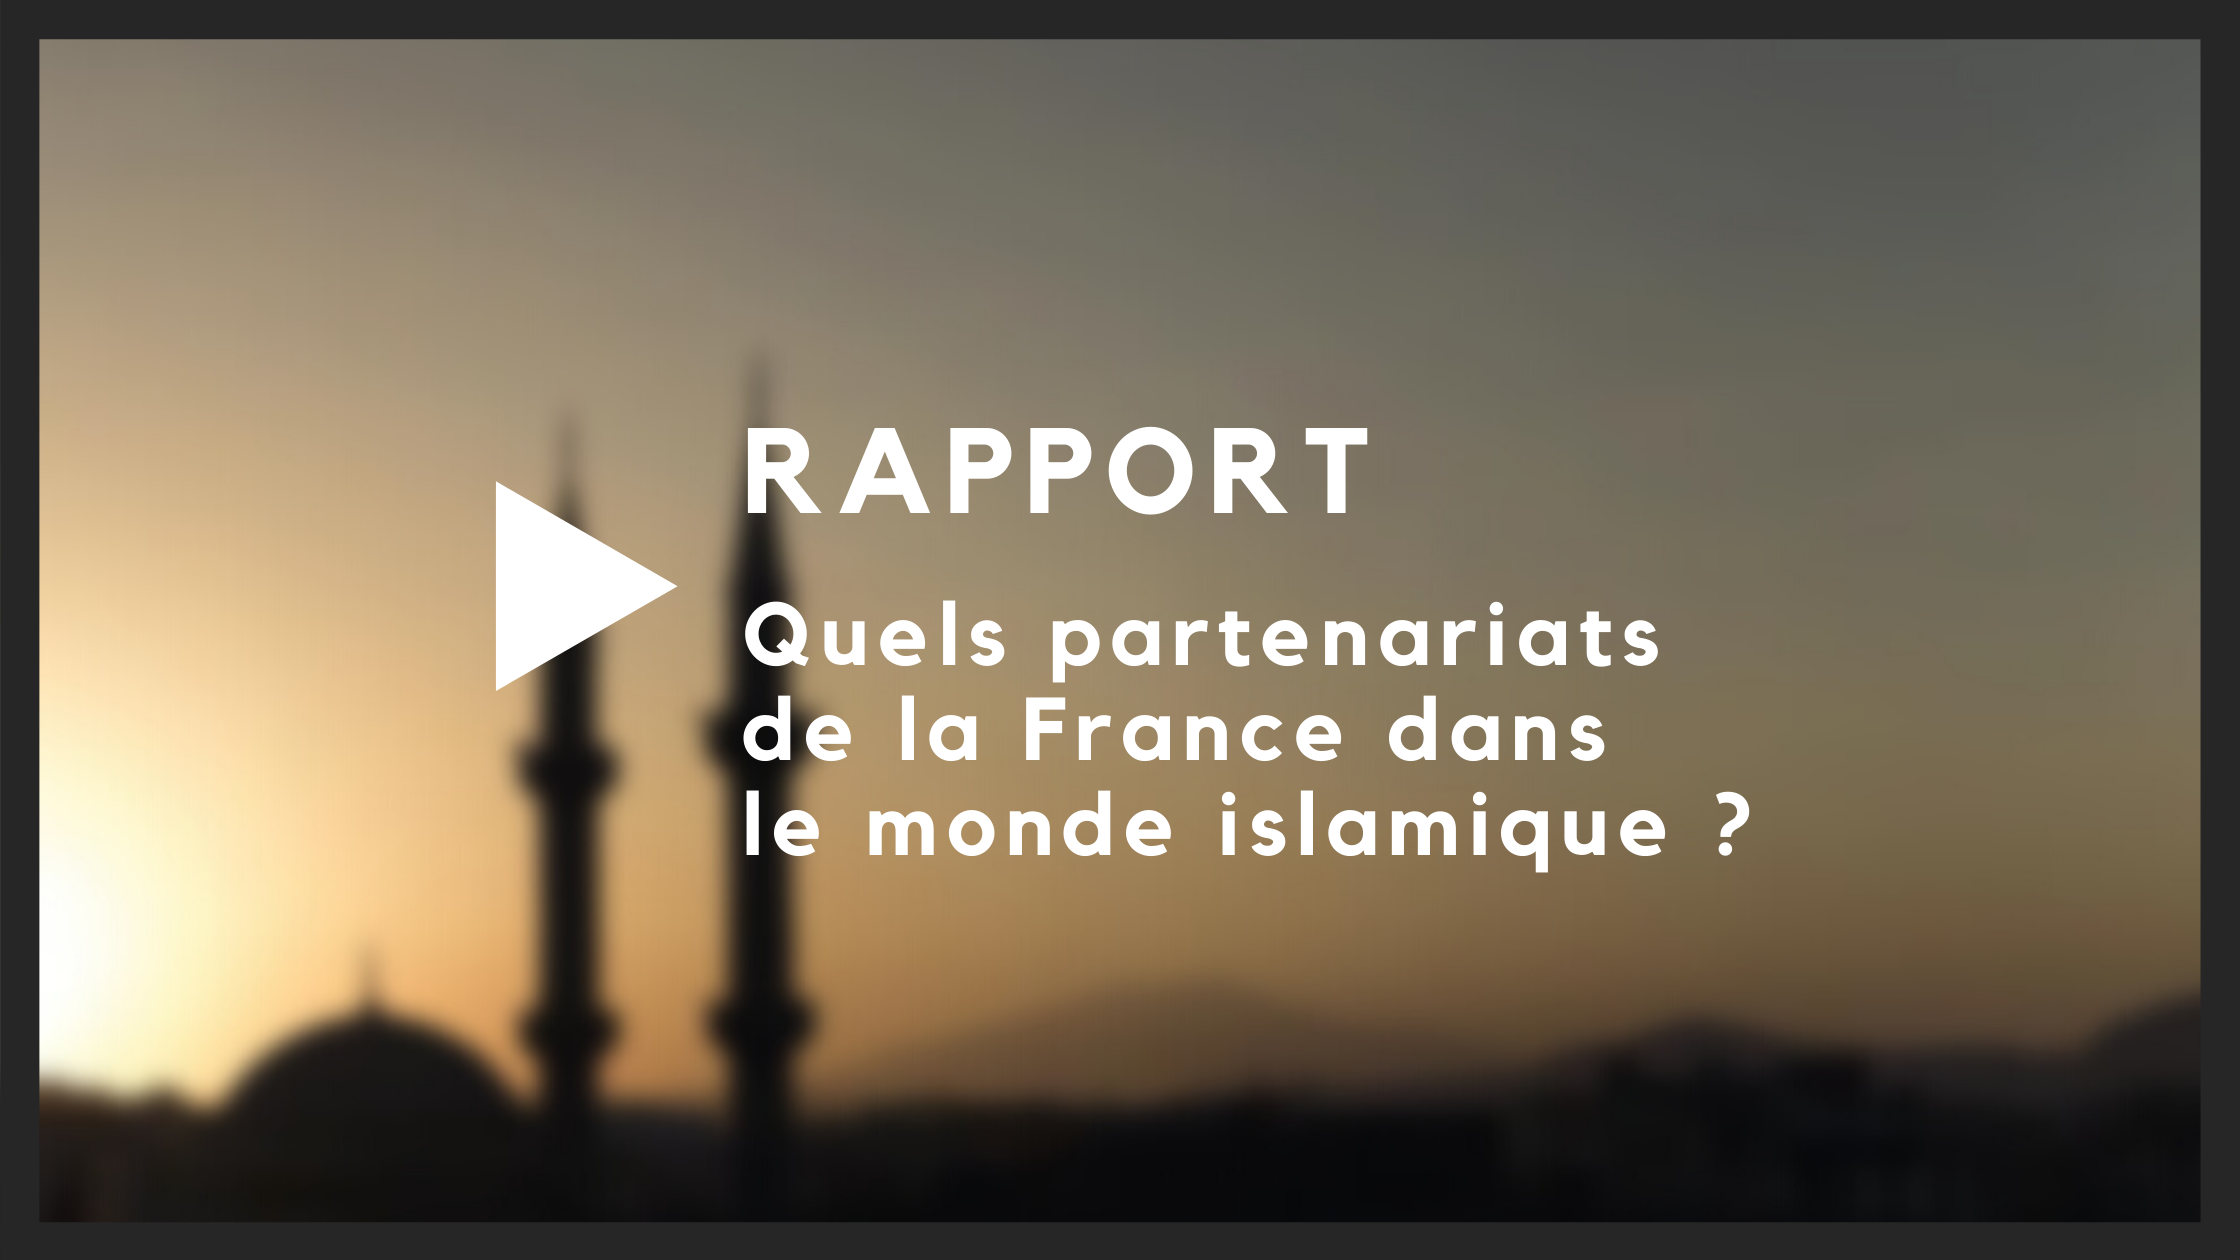 Rapport de GRA : Quels partenariats de la France dans le monde islamique ?